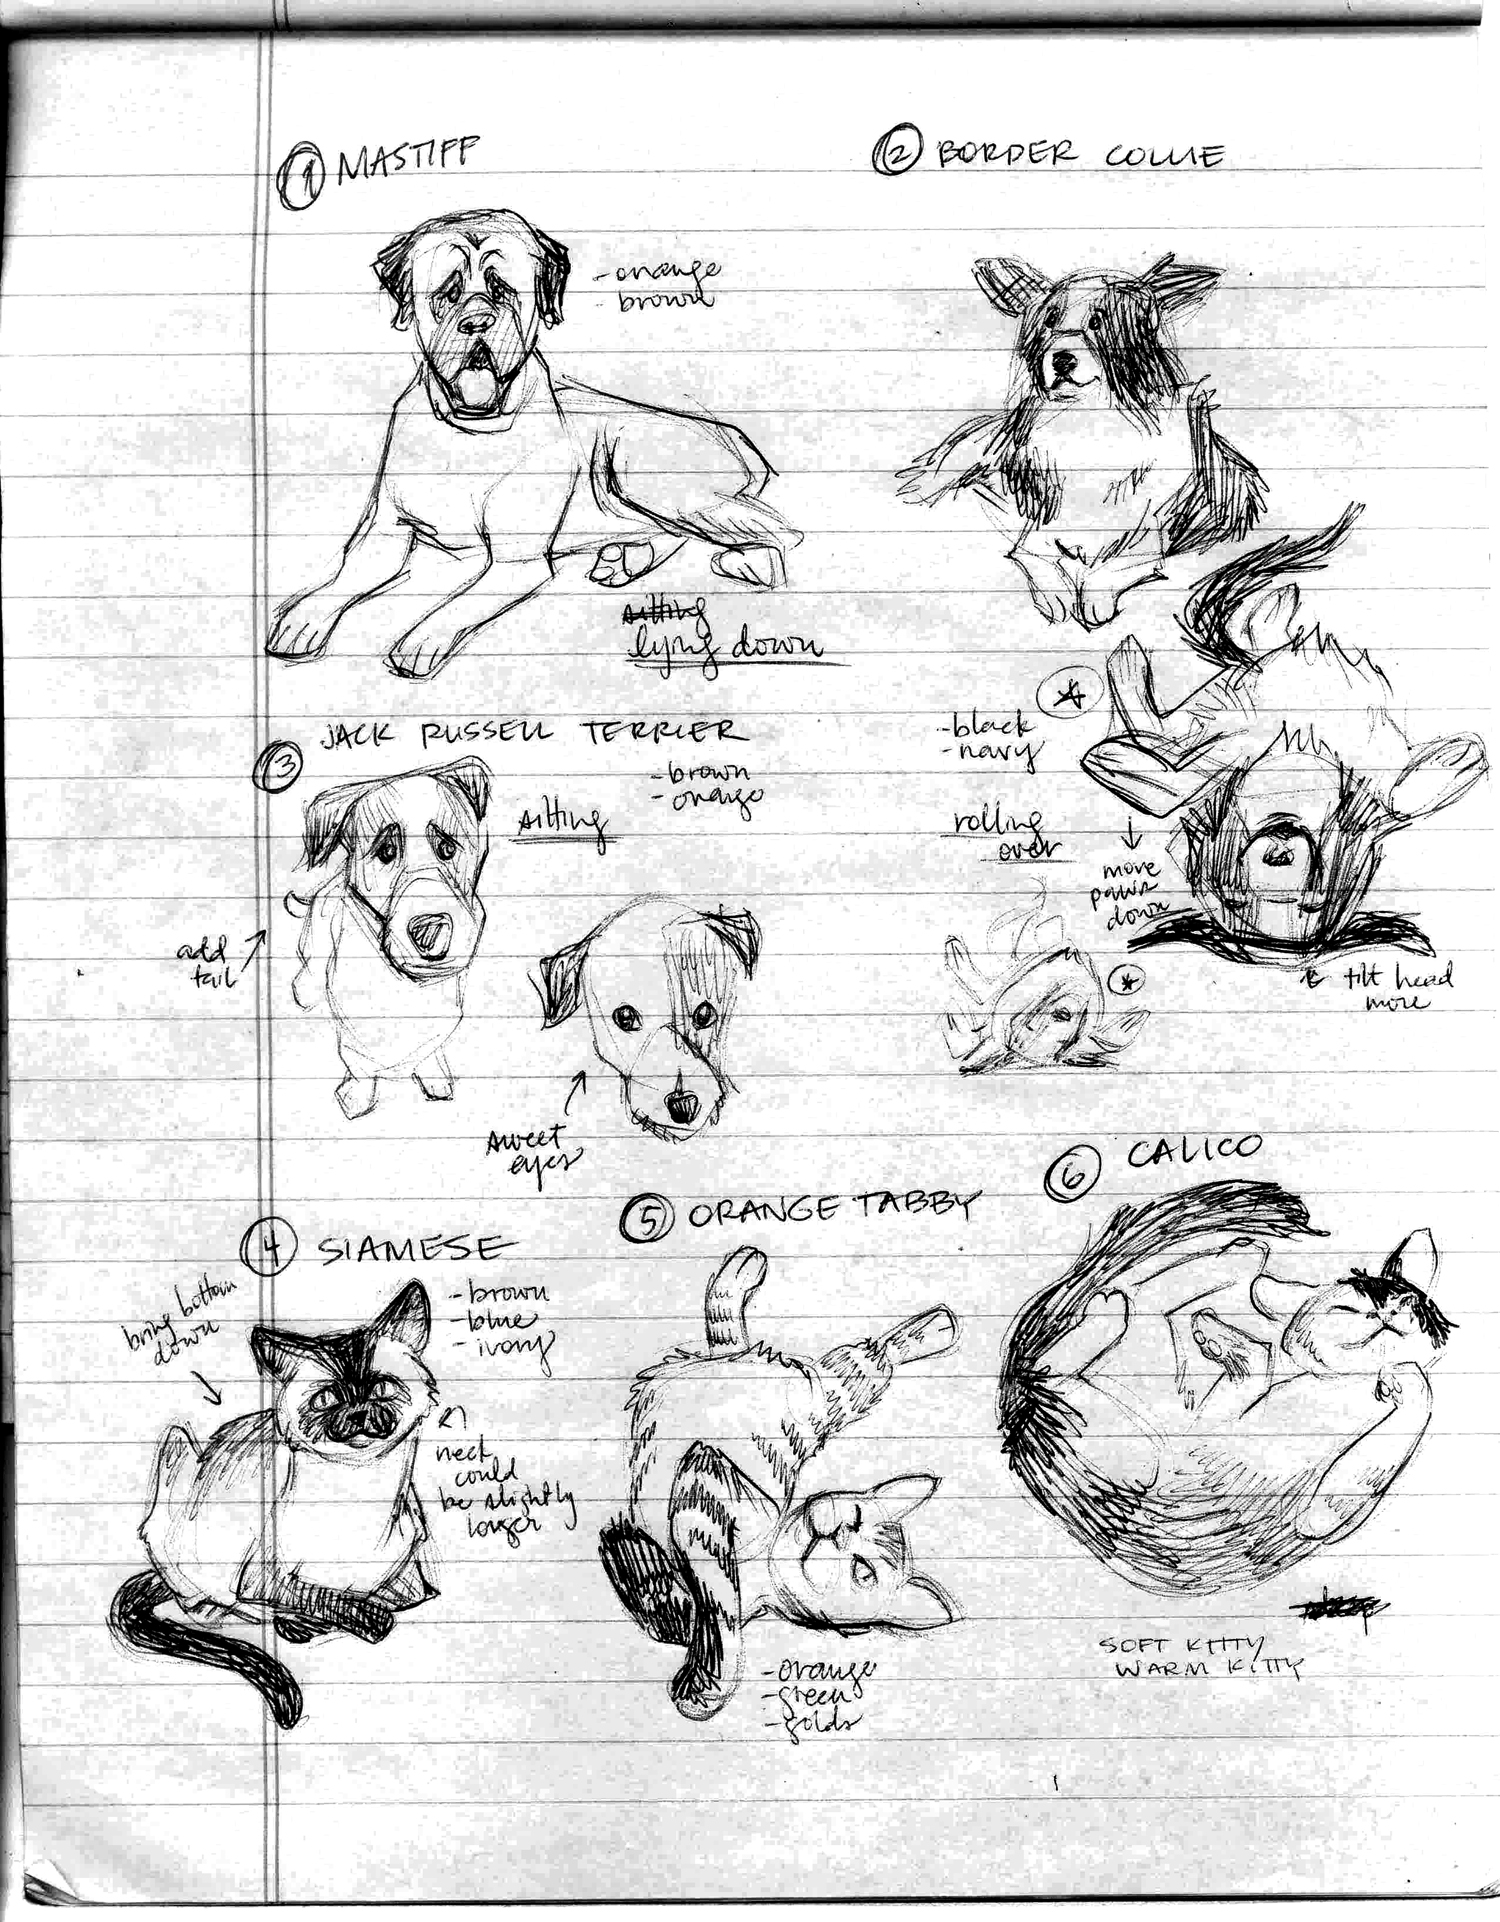 archer_malmo_pfizer_sketches.jpg